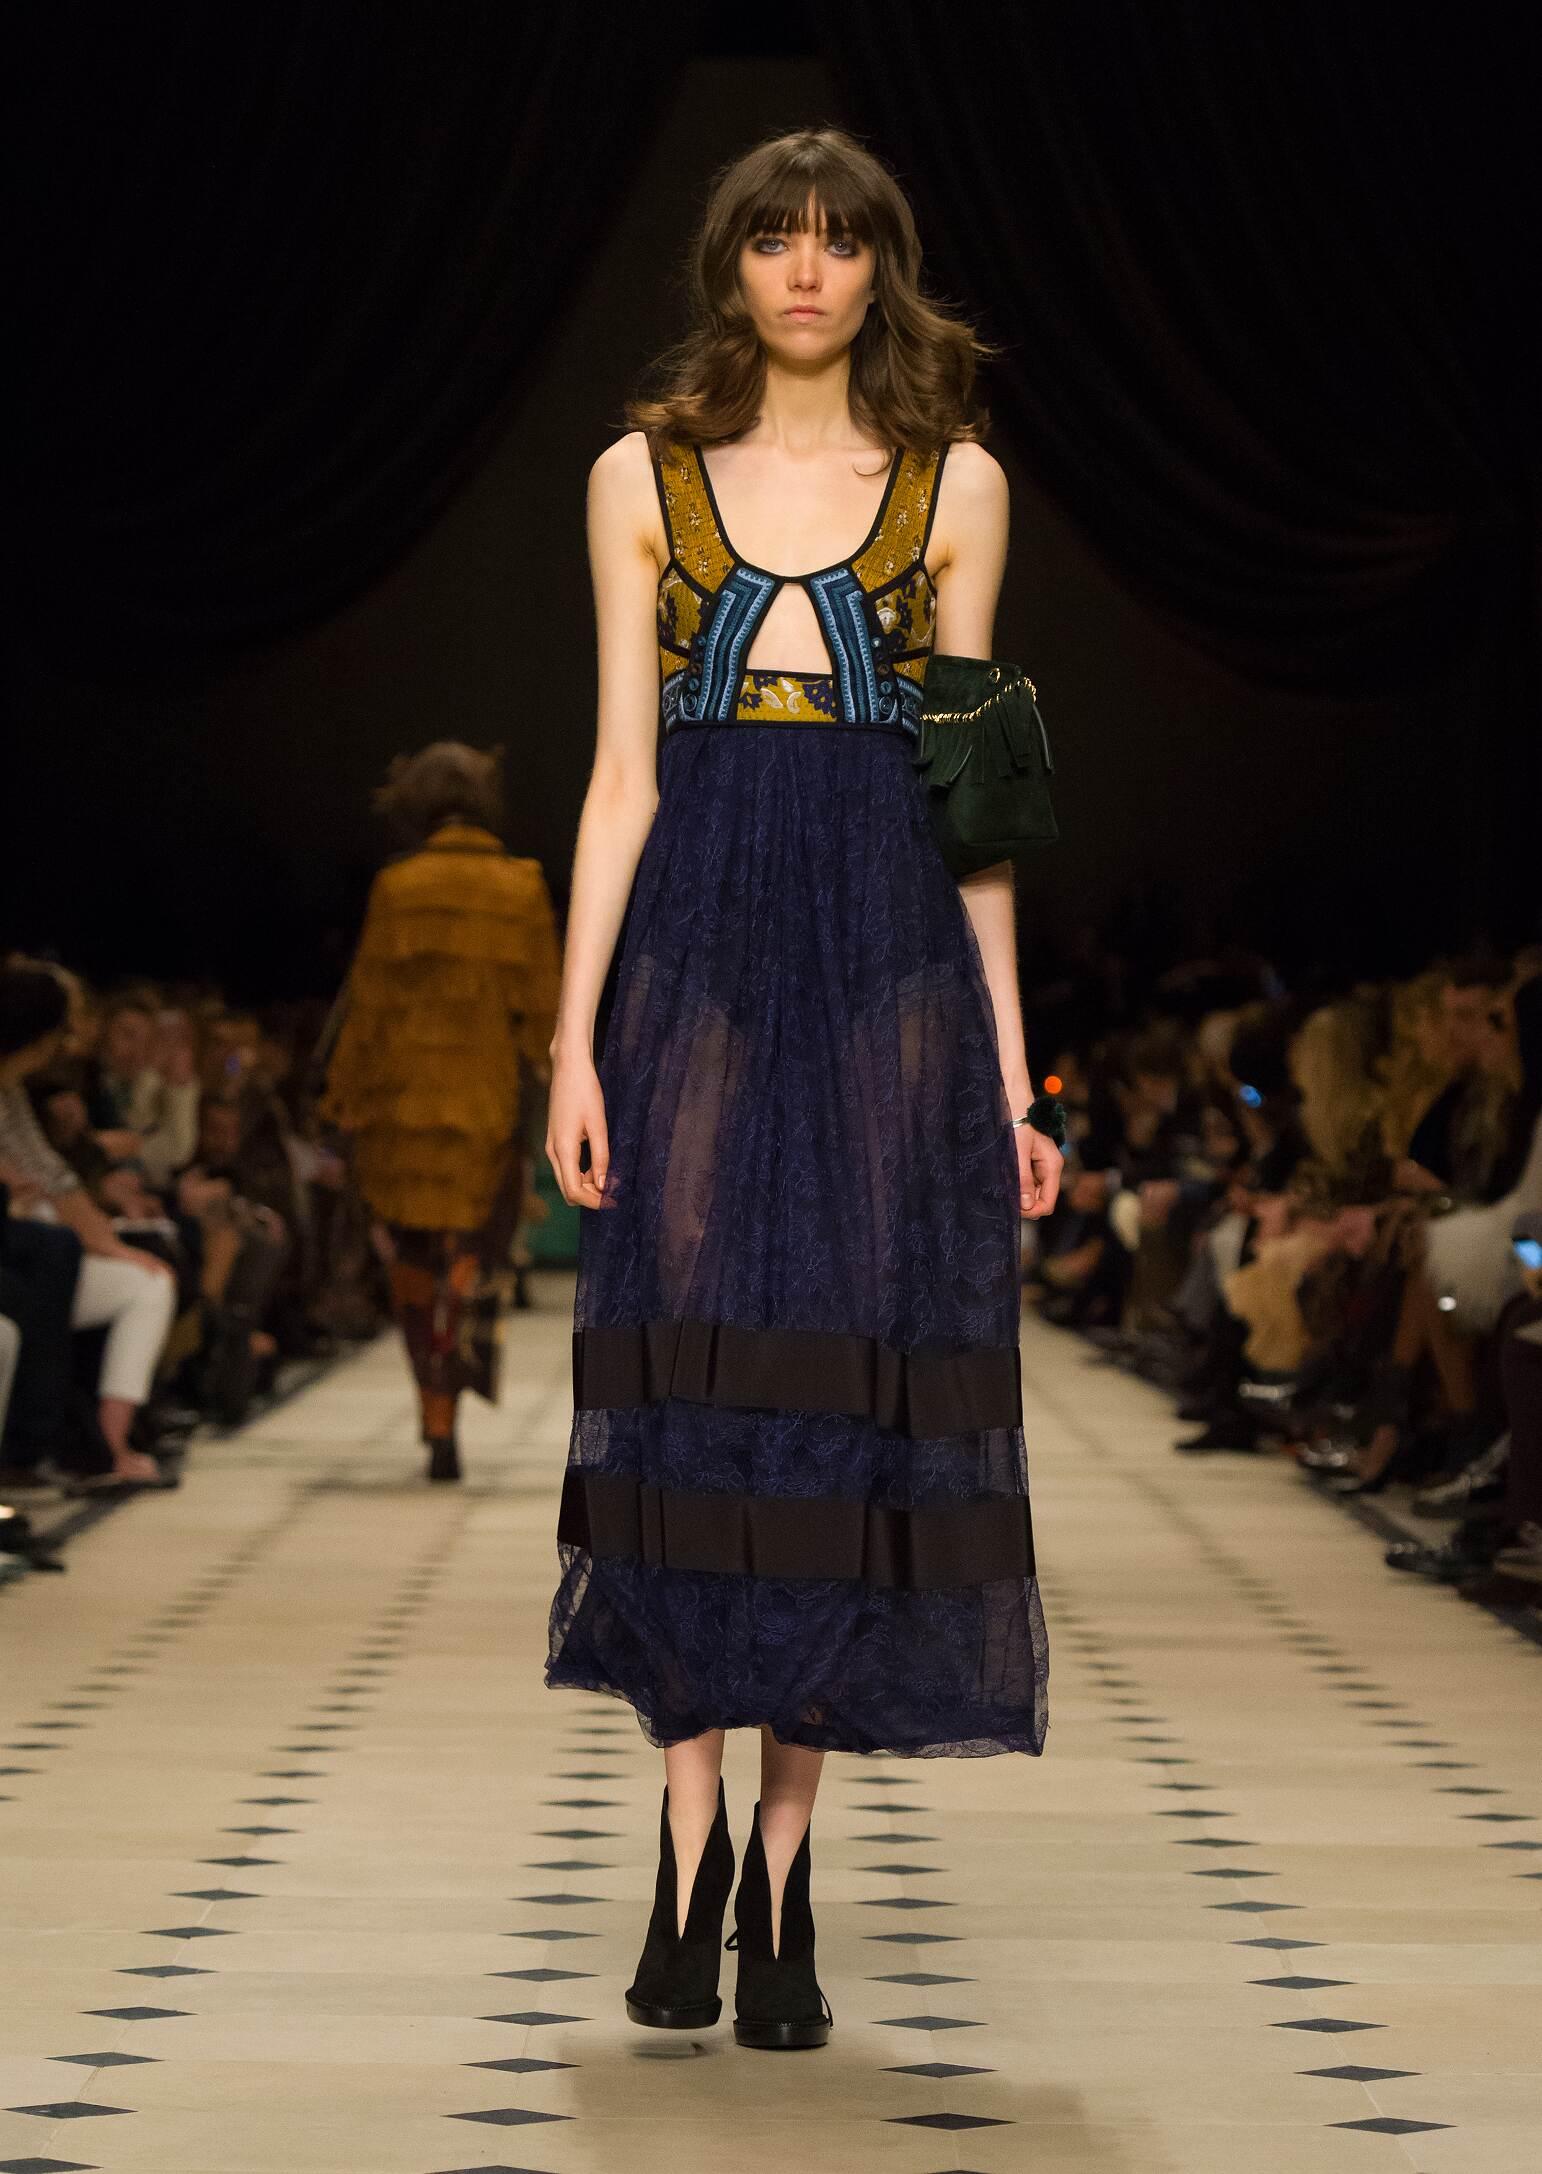 Burberry Prorsum Fall Winter 2015 16 Women's Collection London Fashion Week